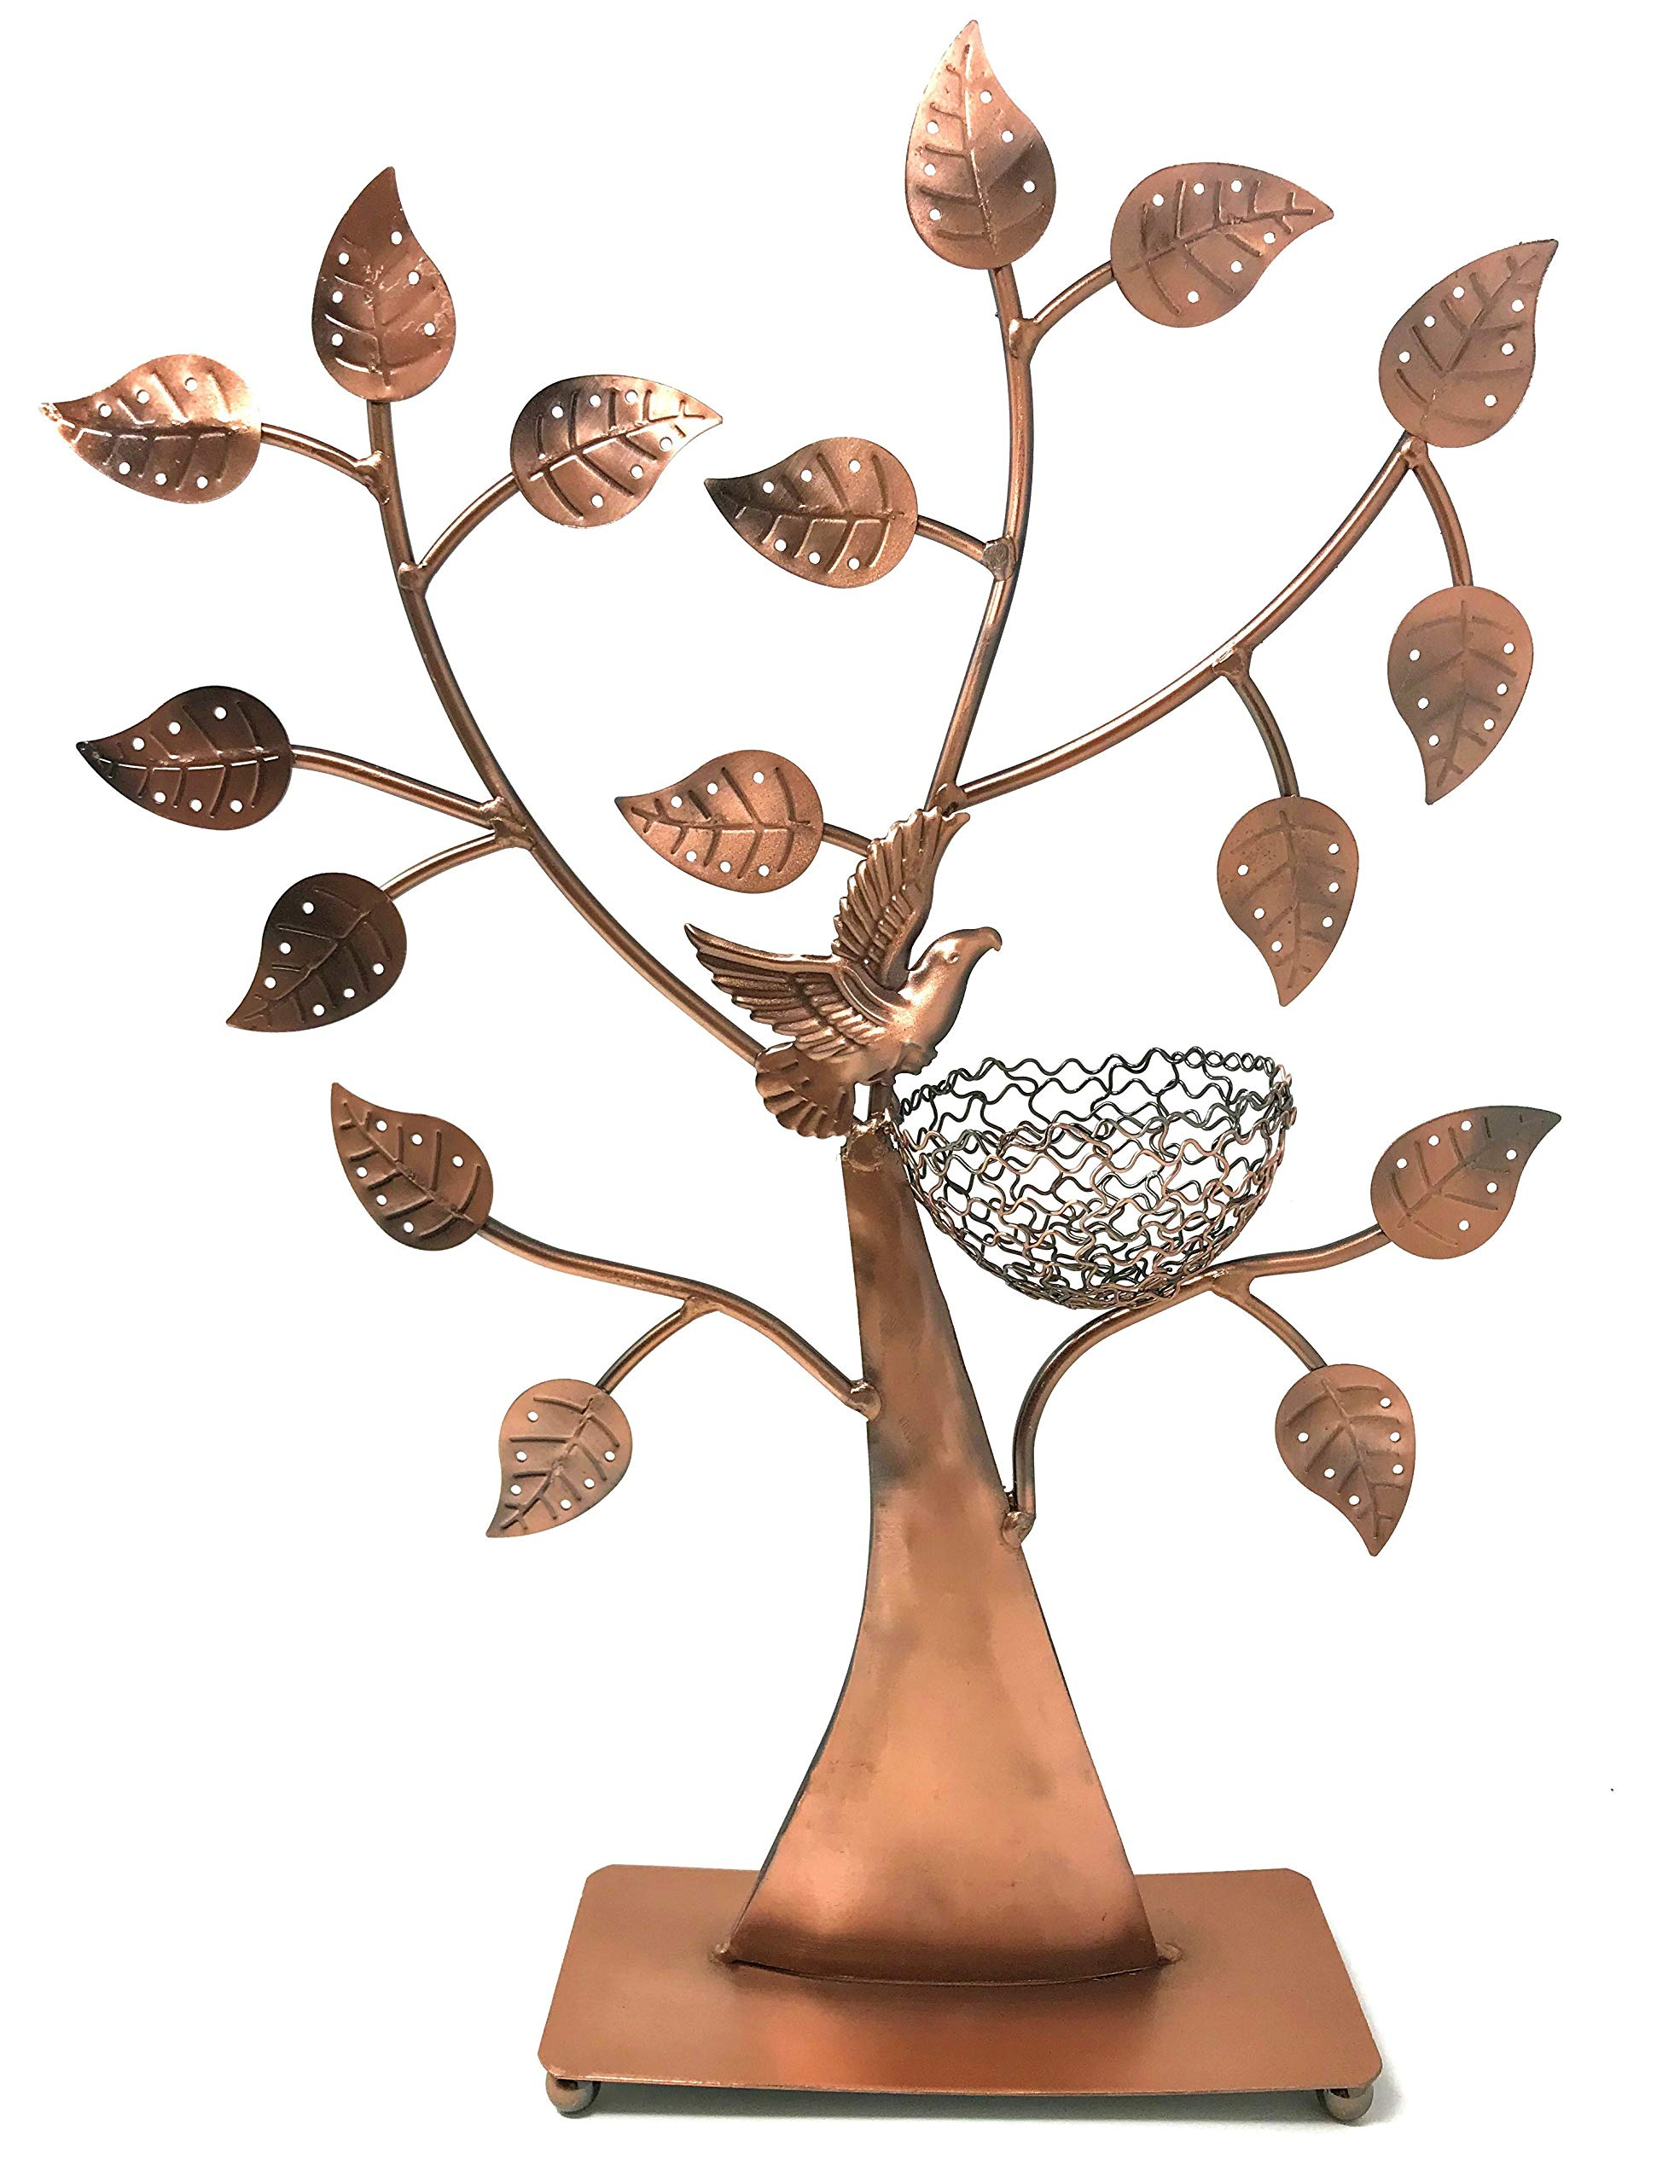 Bird Nest Jewelry Tree Earring Holder~Bracelet Stand~Necklace Organizer Jewelry Display (Bronze) by BJ Display